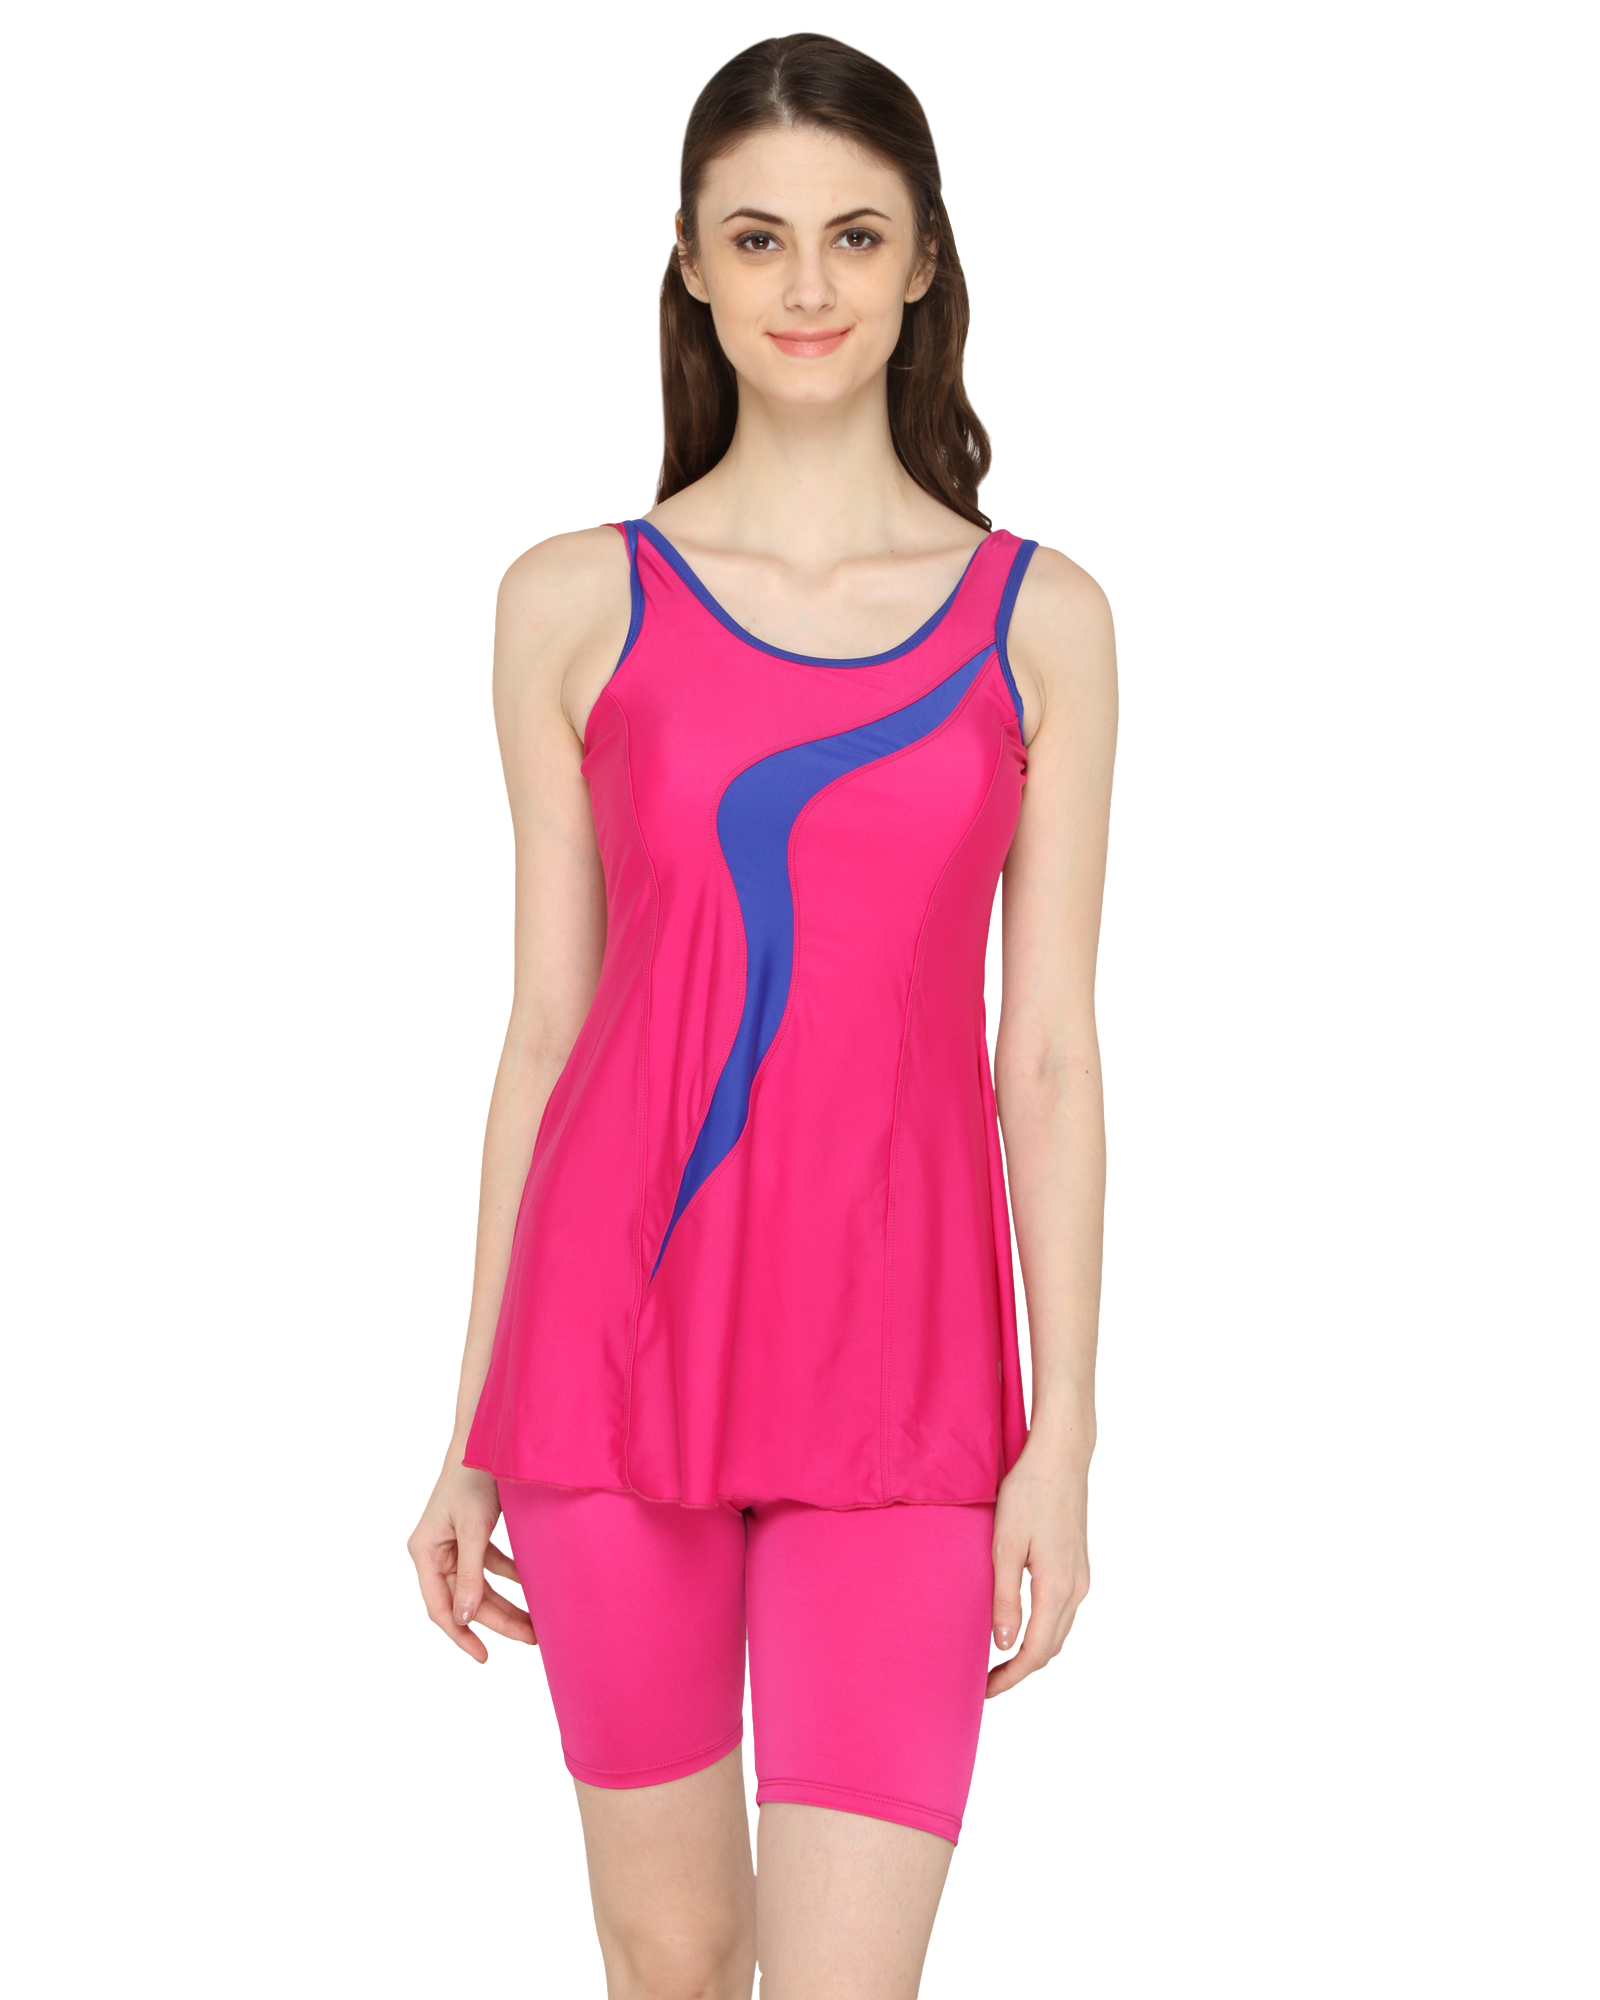 Pink Swim wear